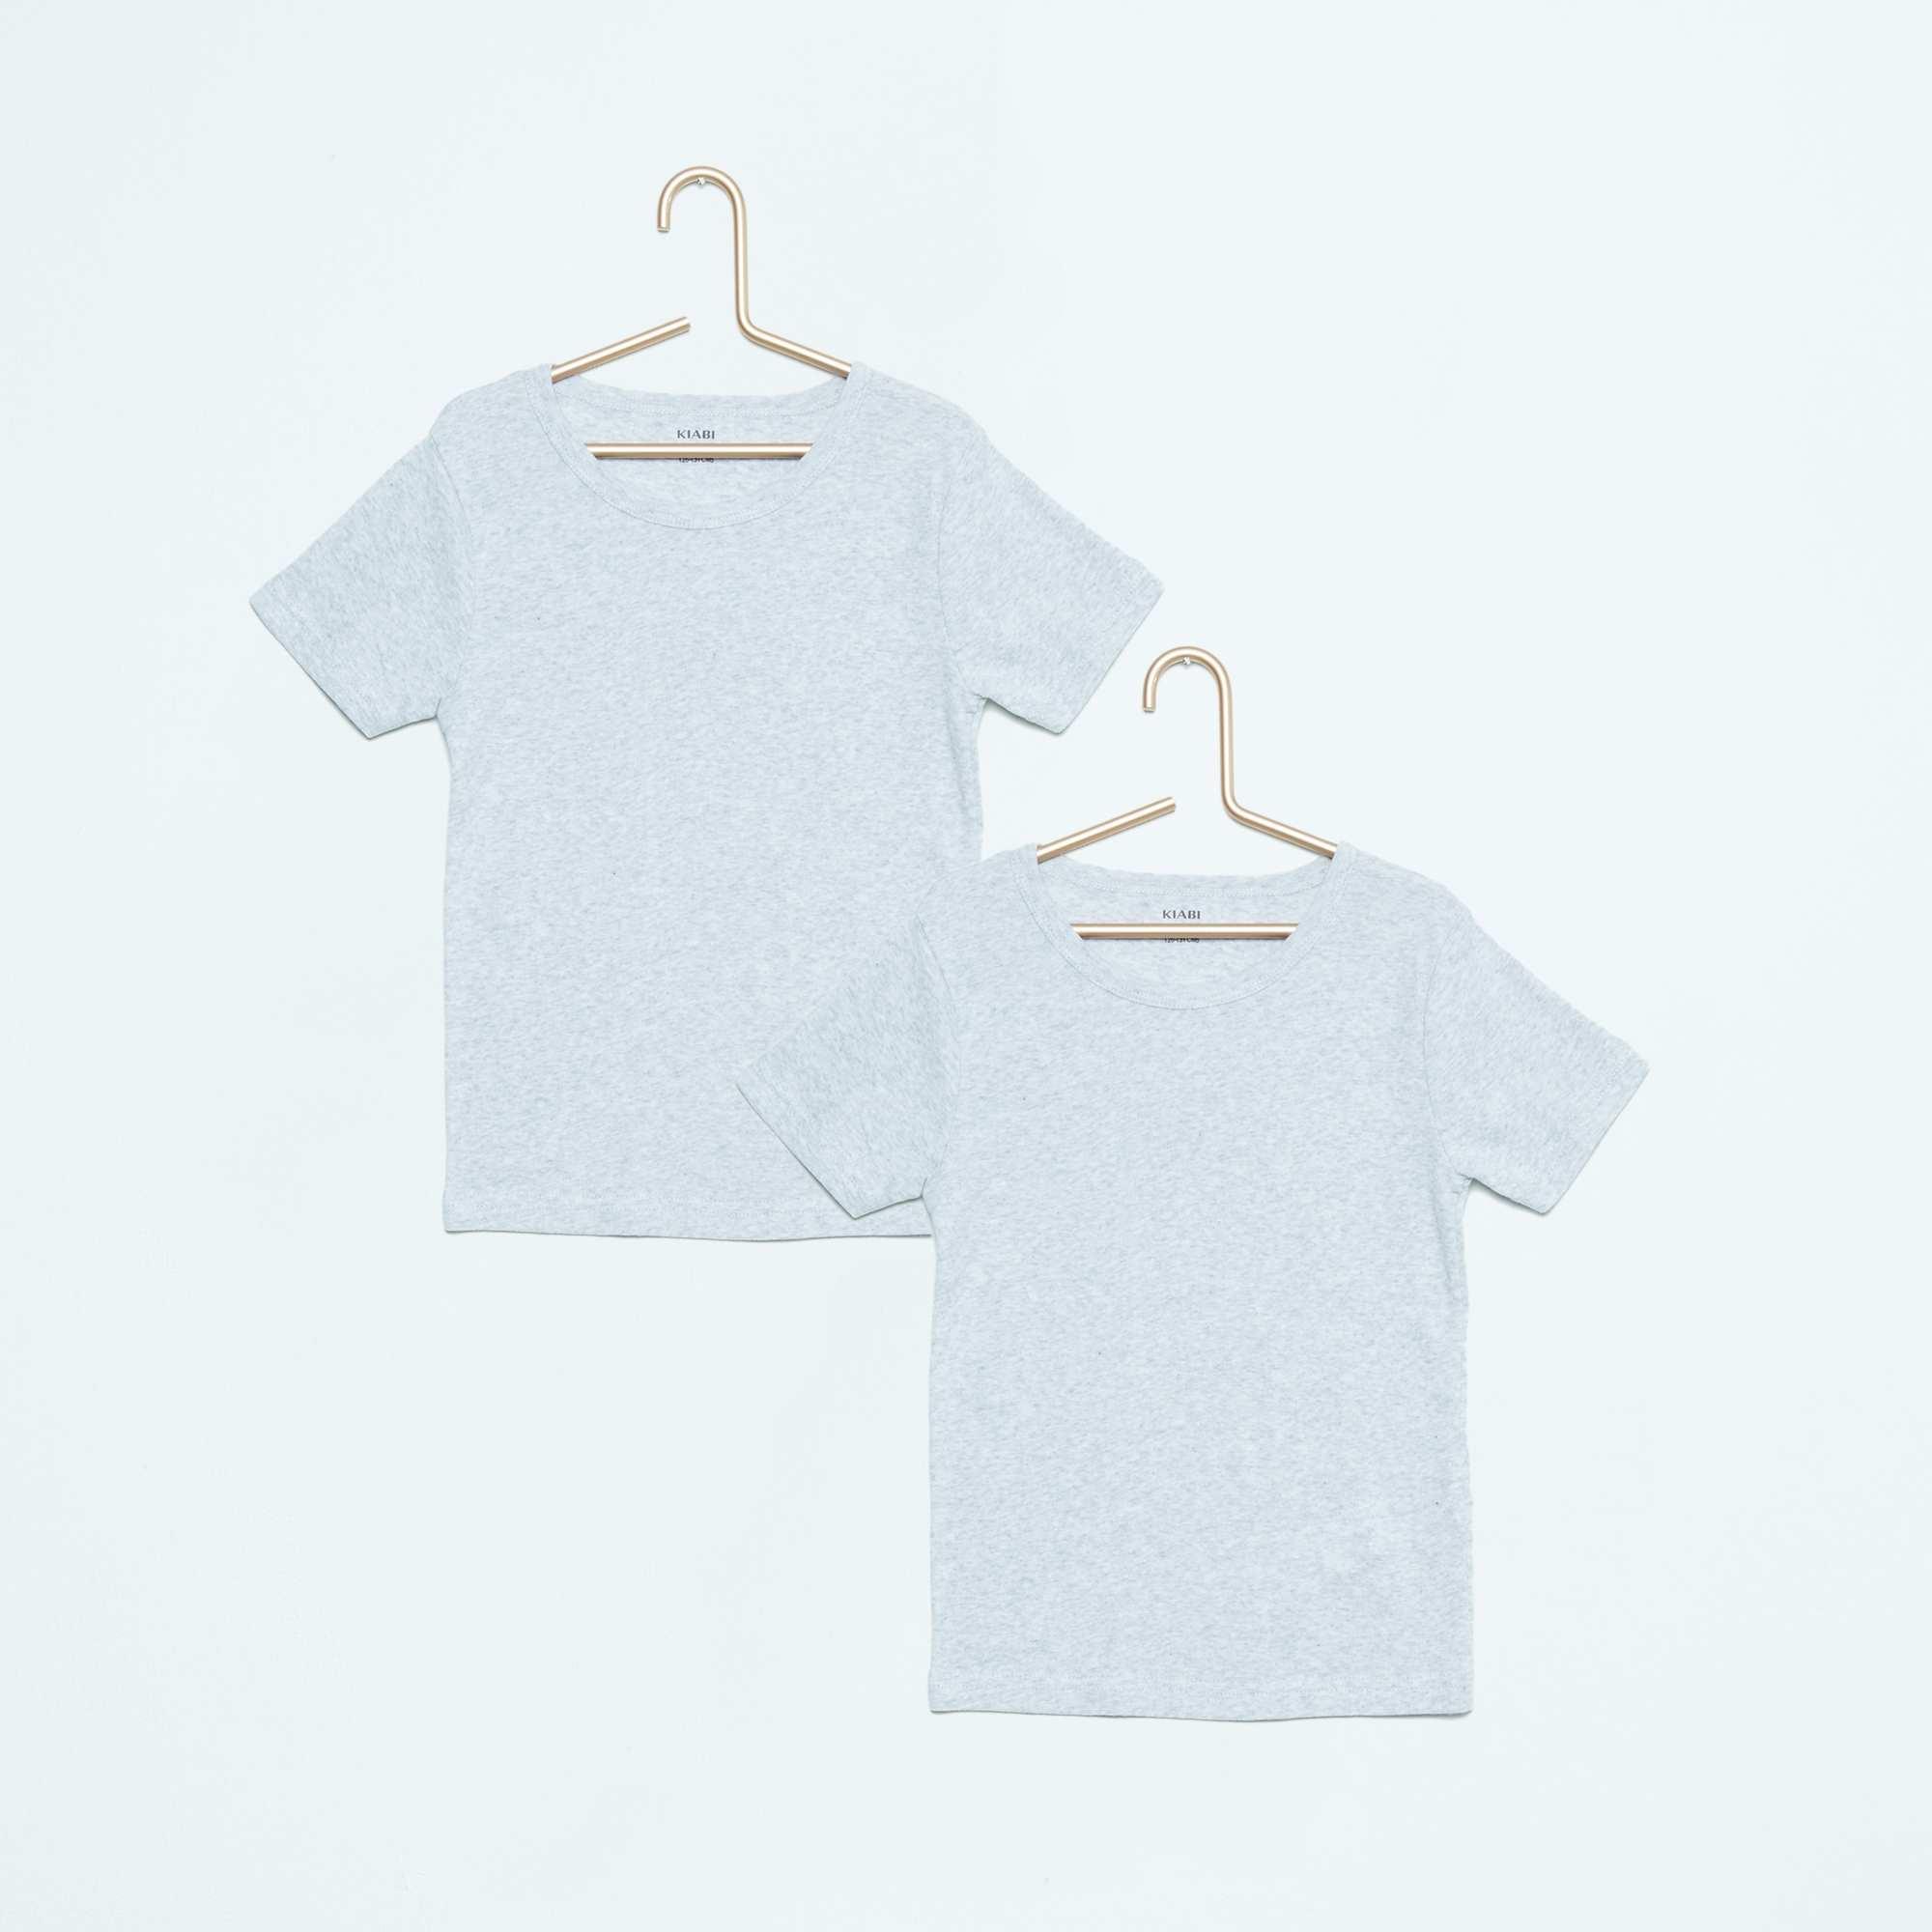 lot de 2 tee shirt coton fille gris kiabi 4 20. Black Bedroom Furniture Sets. Home Design Ideas